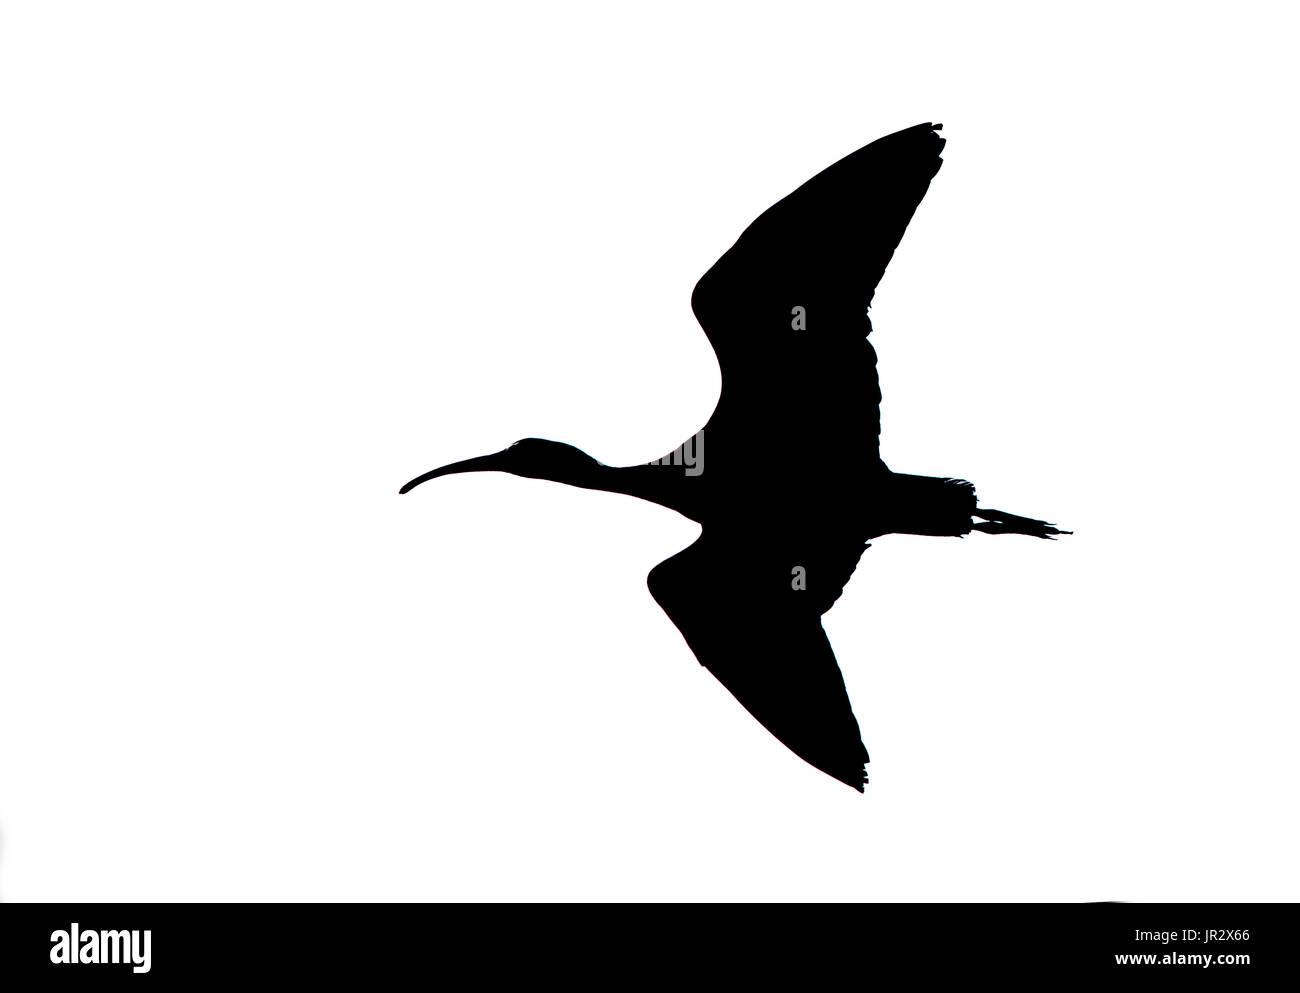 Spoonbill in flight at spring - Camargue France - Stock Image